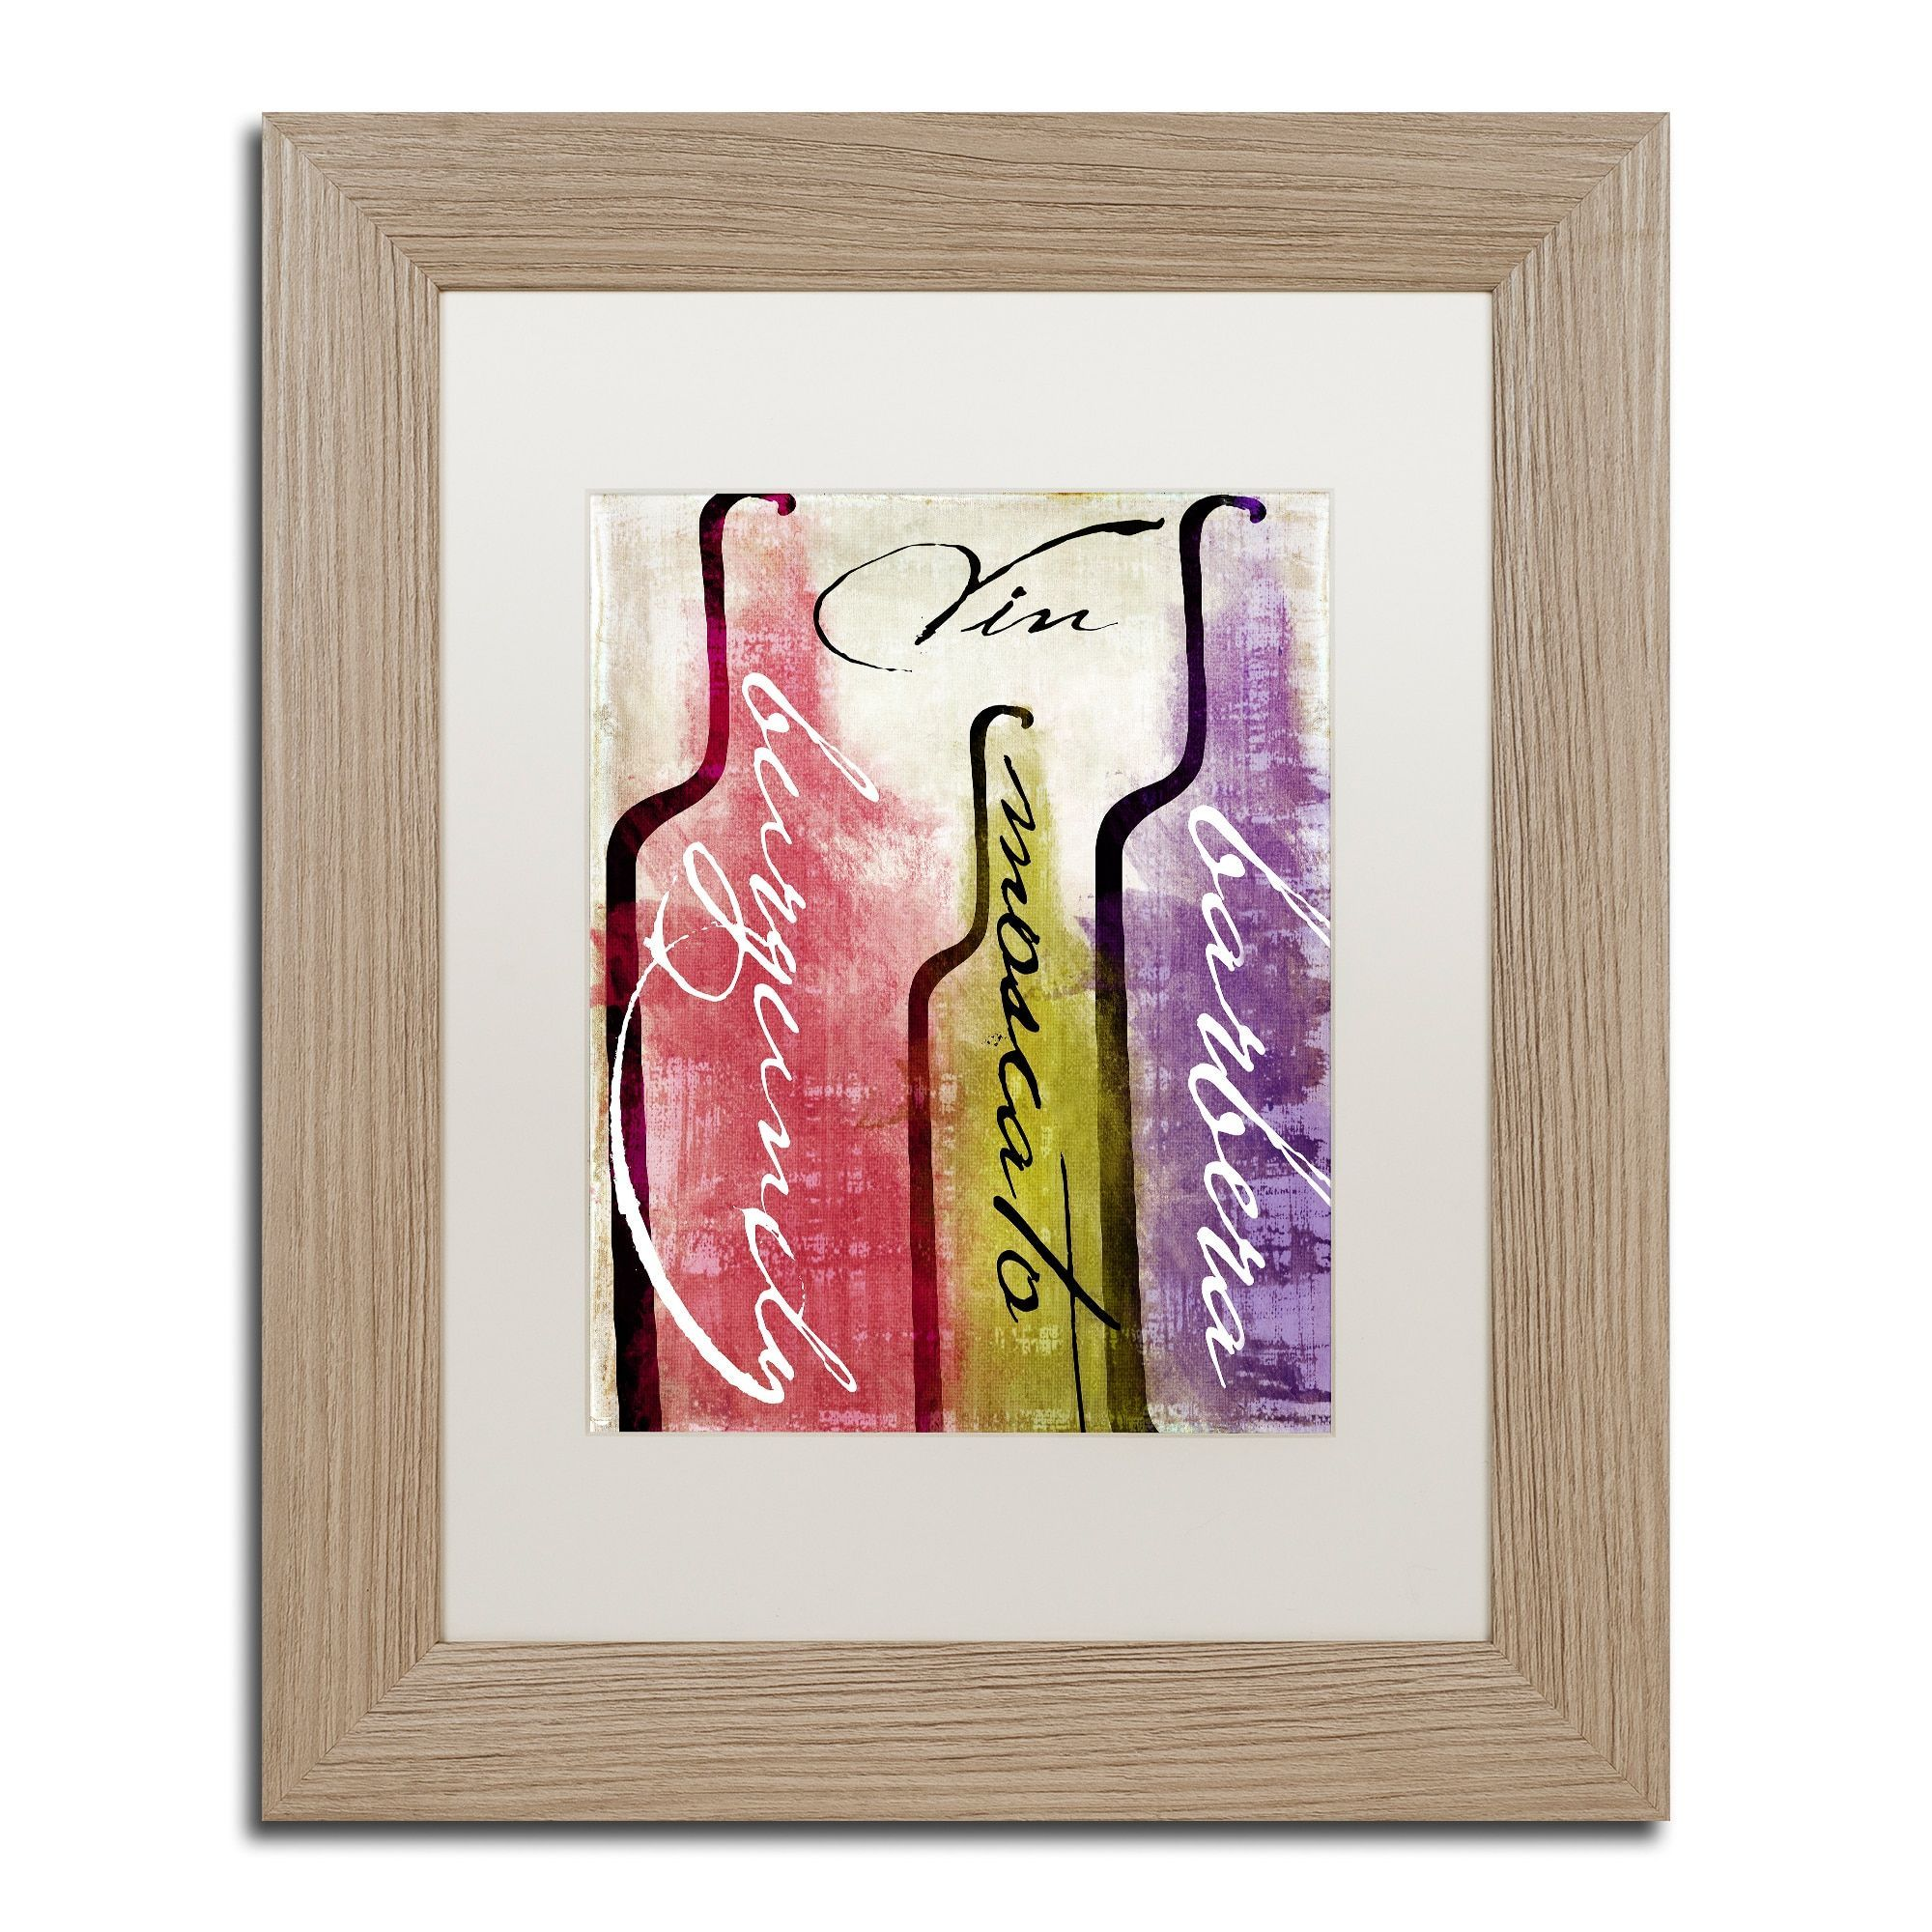 Color bakery uwine tasting iiu matted framed art products